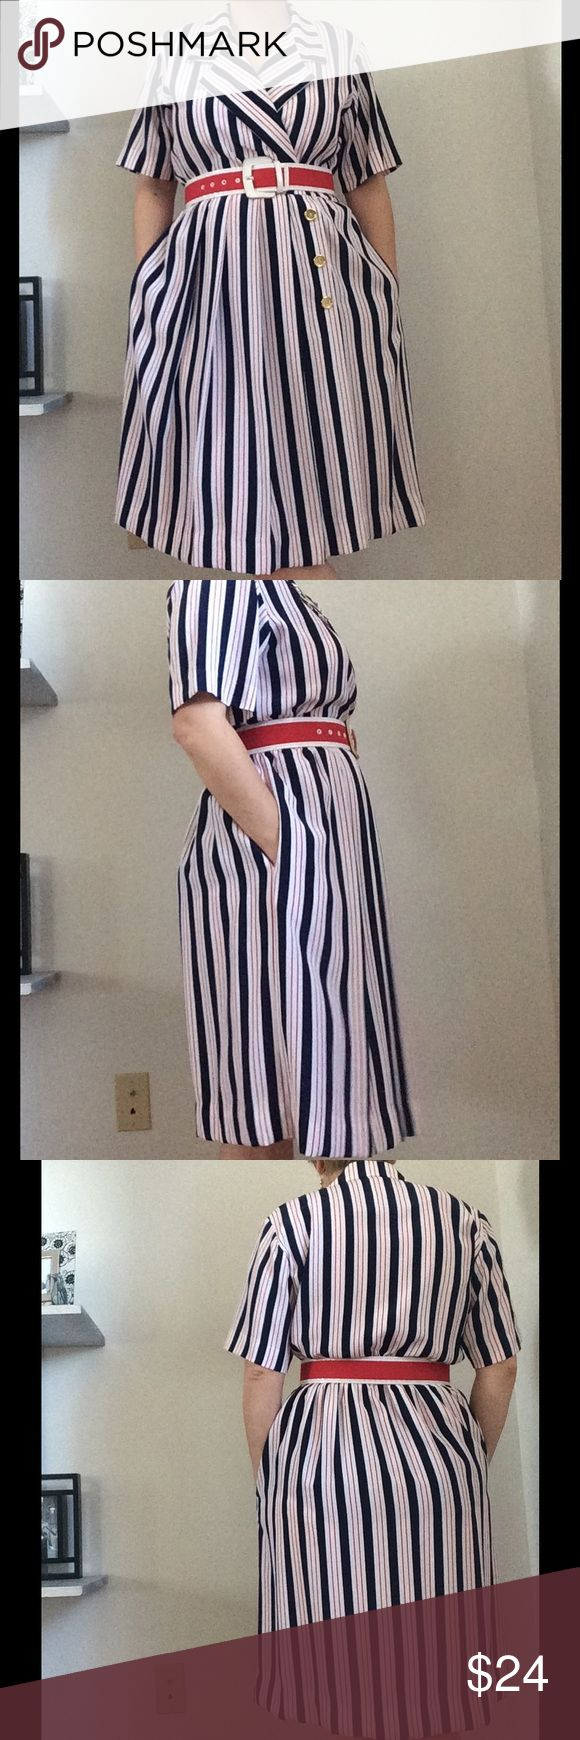 "Vintage Nautical dress Leslie Fay Petites size 8p. 36"" bust. 26-30"" waist 40"" in length. Belt not included Vintage Dresses Midi"